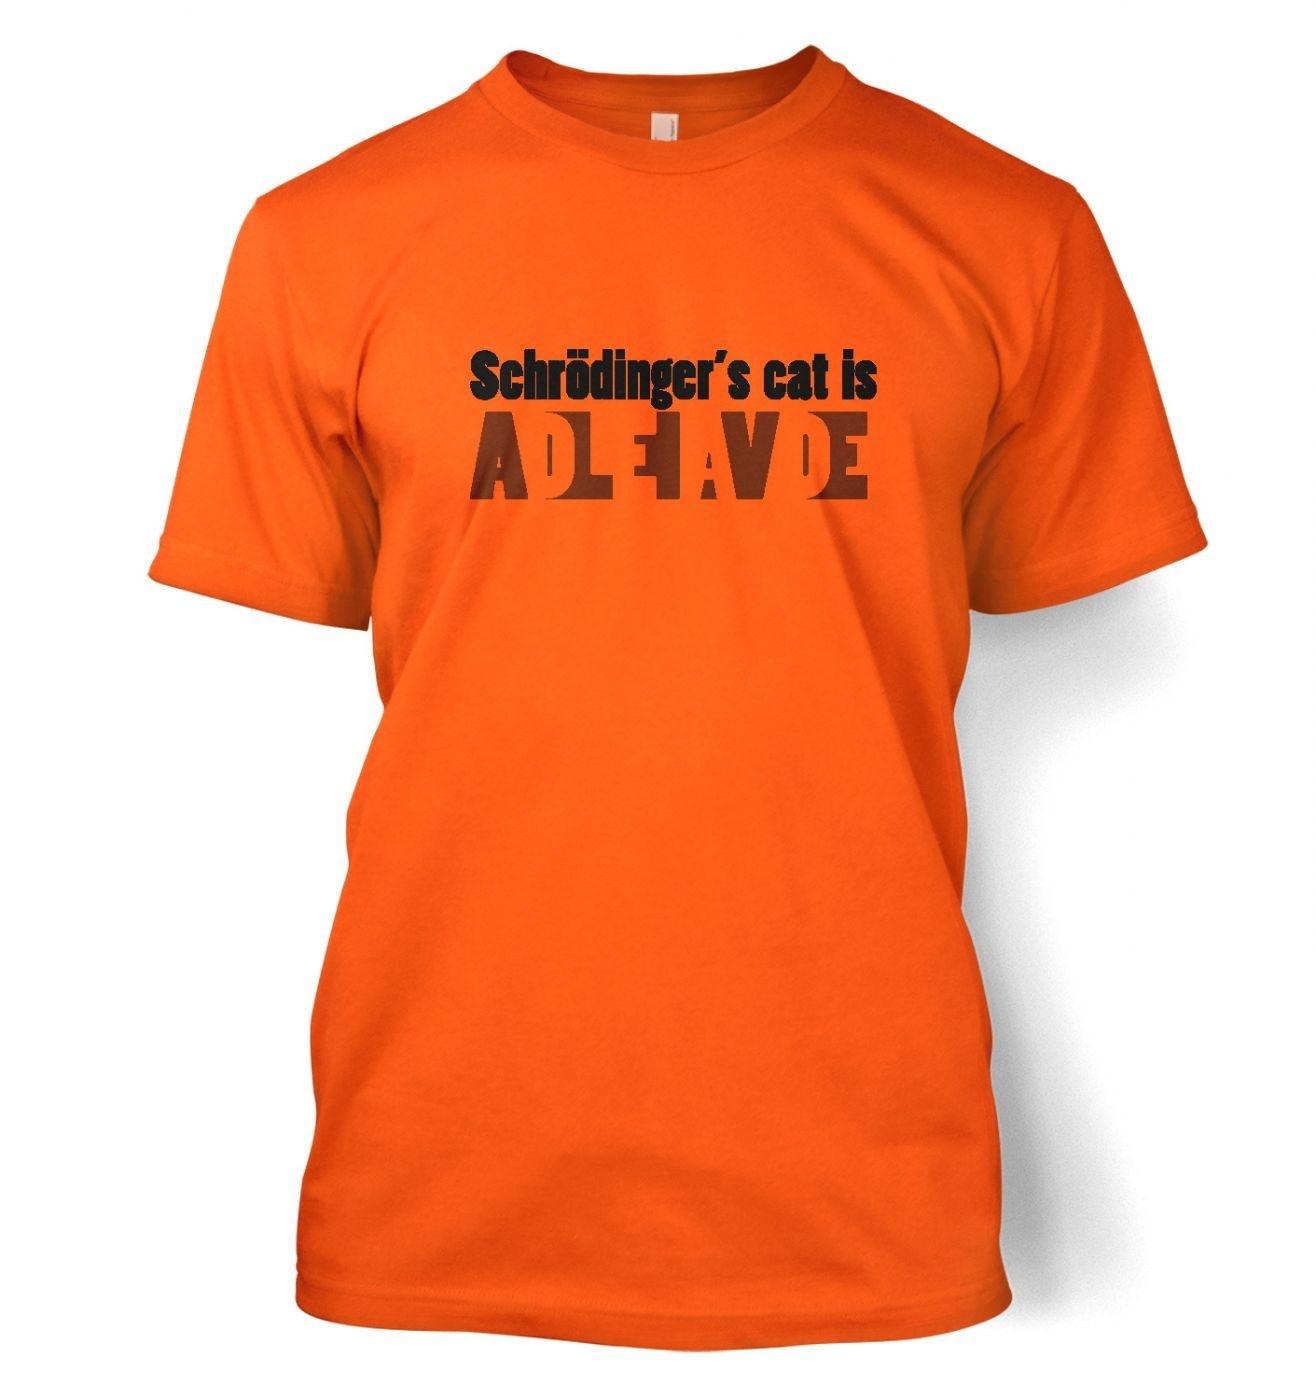 Schrodinger's Cat Is Dead And Alive men's t-shirt